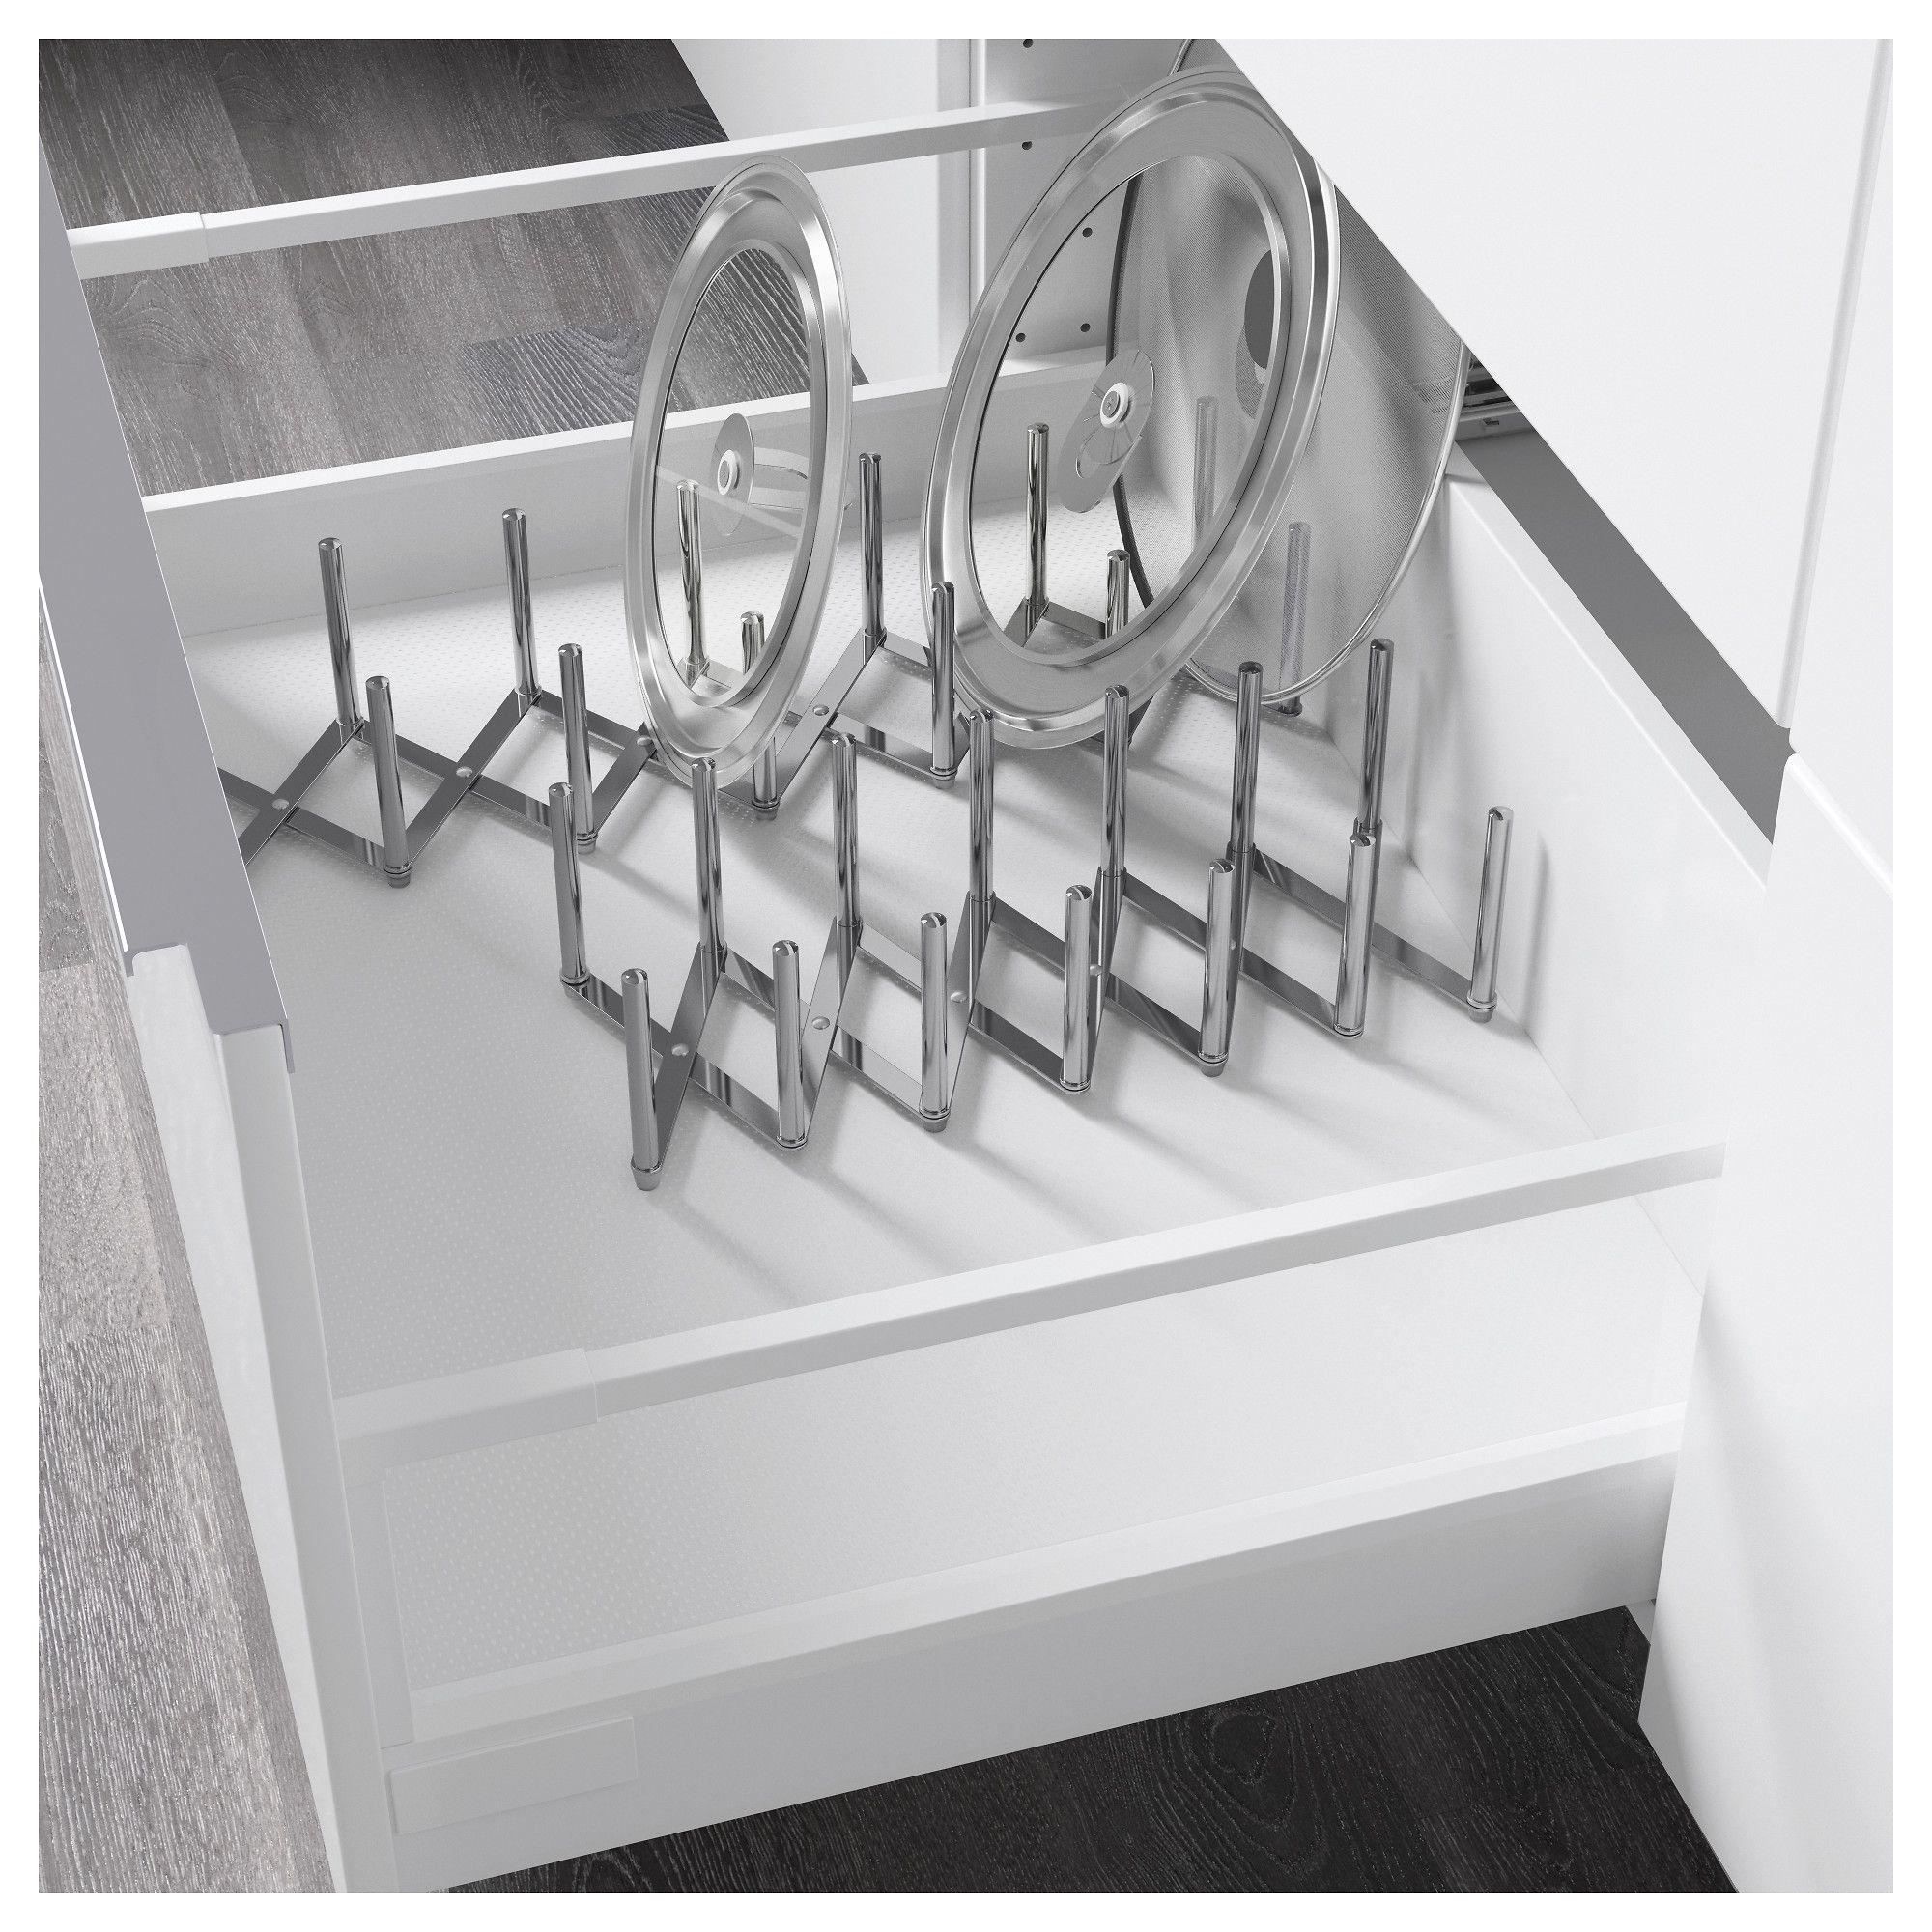 VARIERA stainless steel, Pot lid organiser IKEA   Pot lid